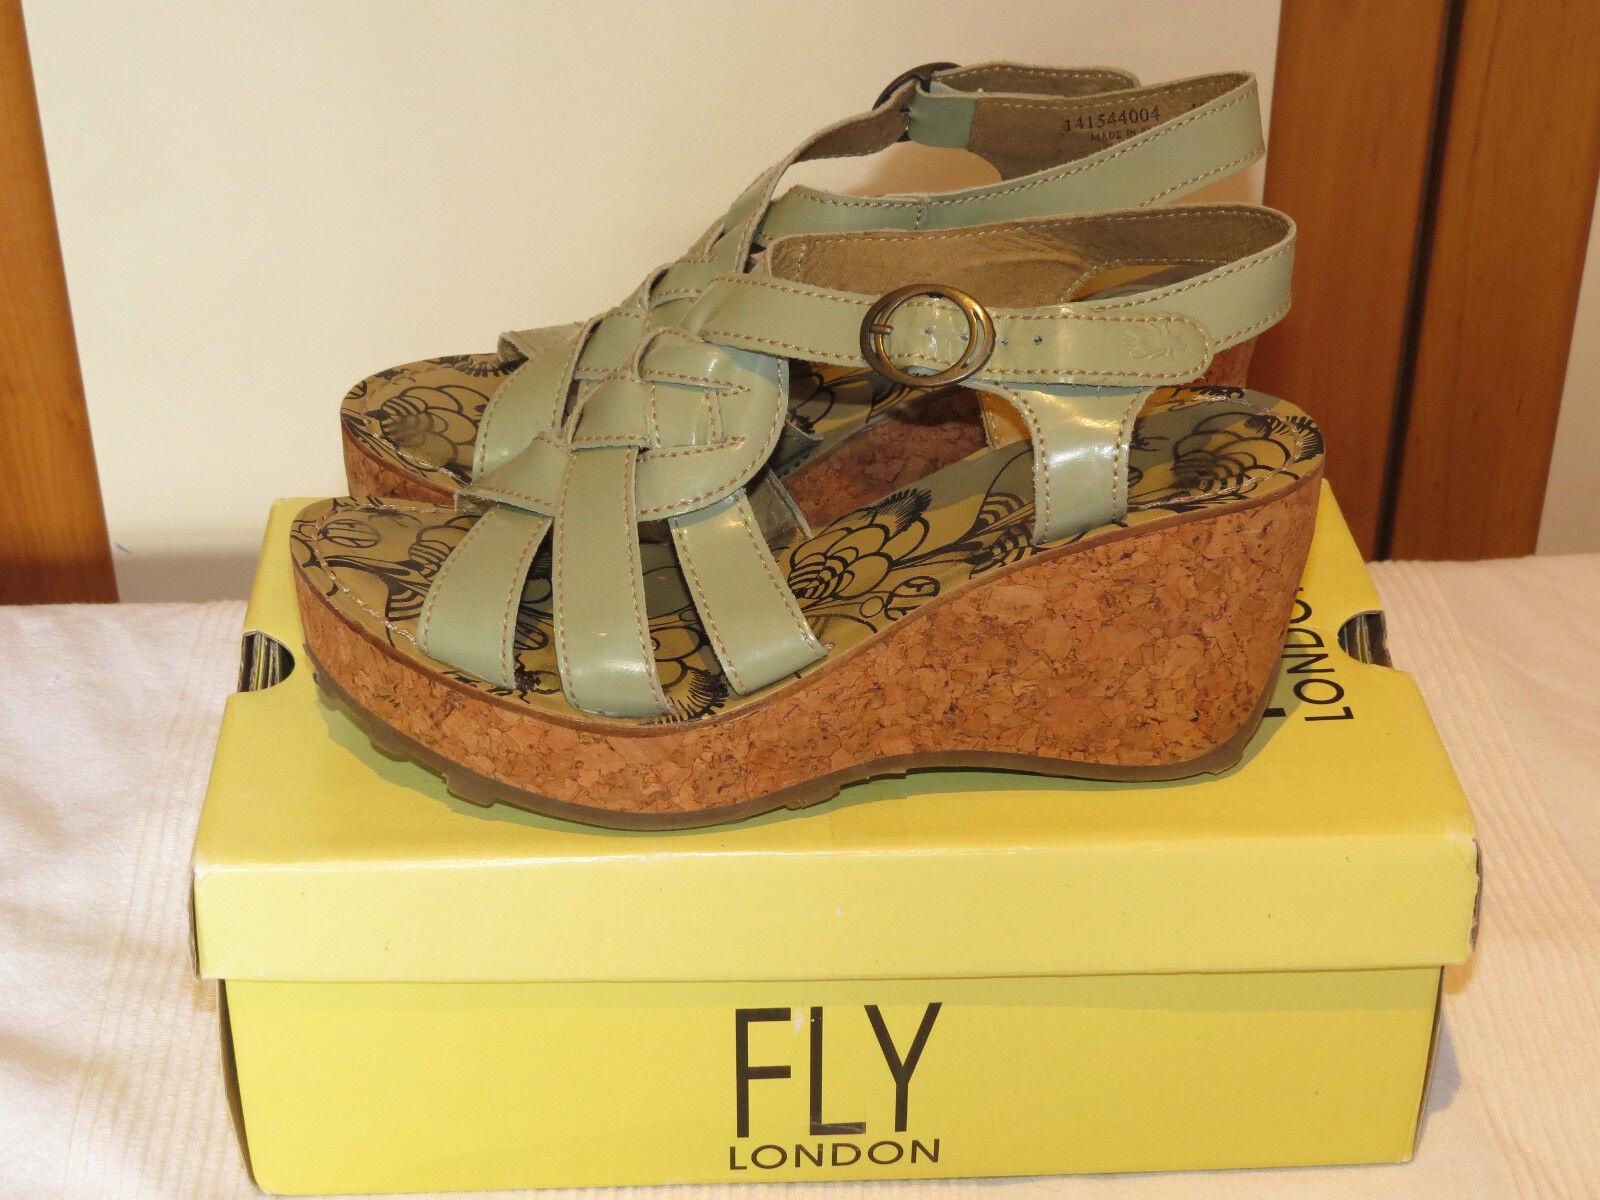 Fly London Grin Cuña Sandalias de Cuña Grin con Plataforma De Charol Diseñador UK 7 40 2625e2